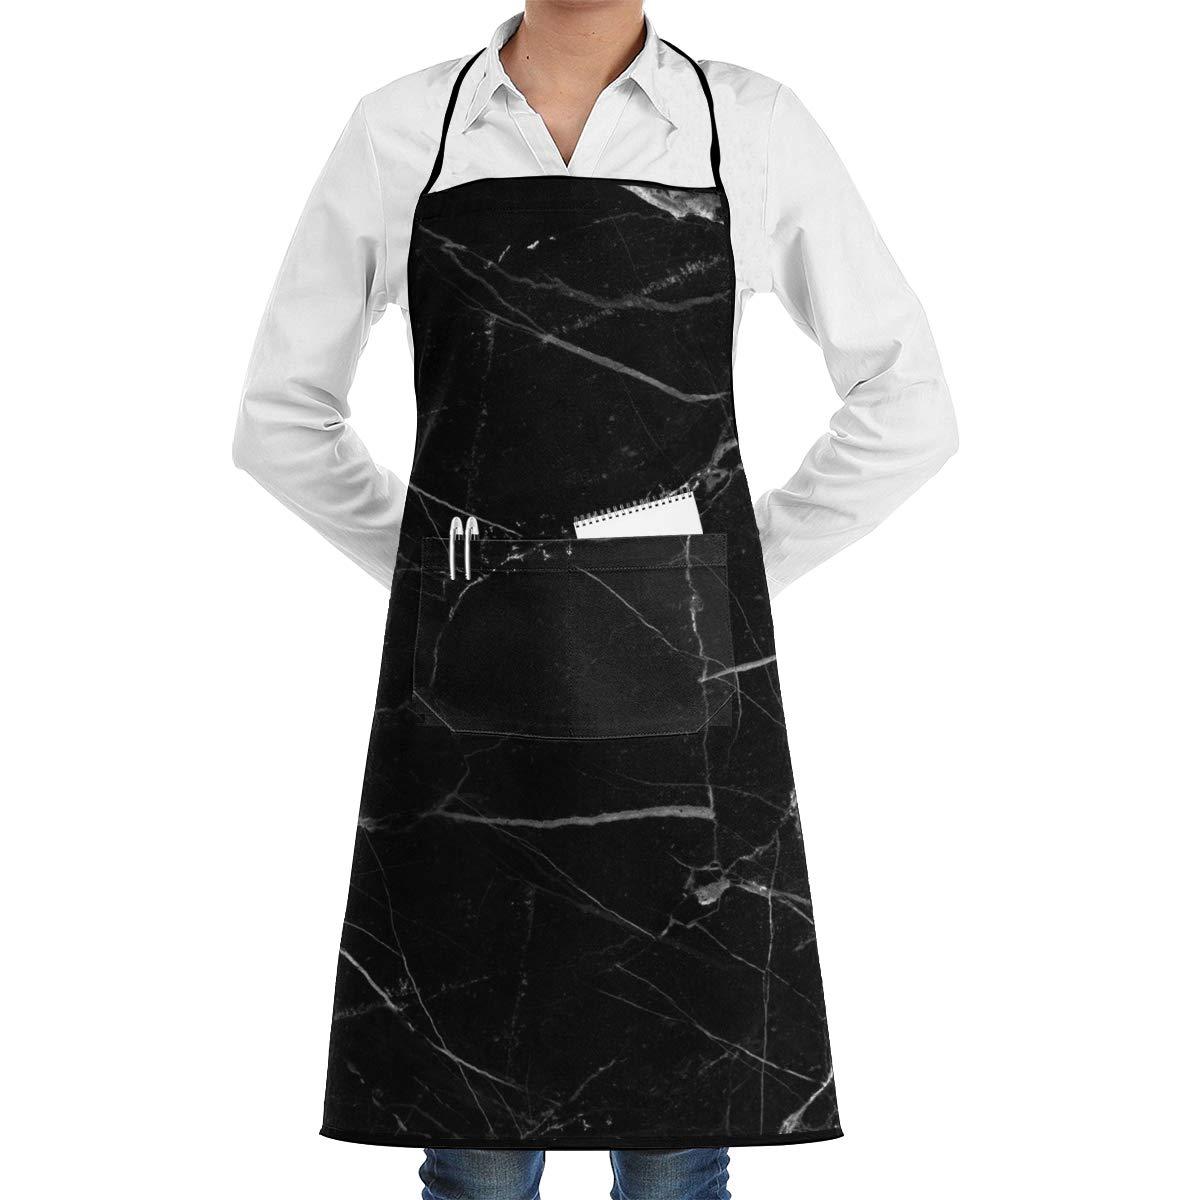 FUNINDIY ビブエプロン ポケット付き ブラック 大理石 キッチンエプロン 防水 料理 ベーカー サーバー BBQ 20インチ X 28インチ   B07L6TZ6Q5